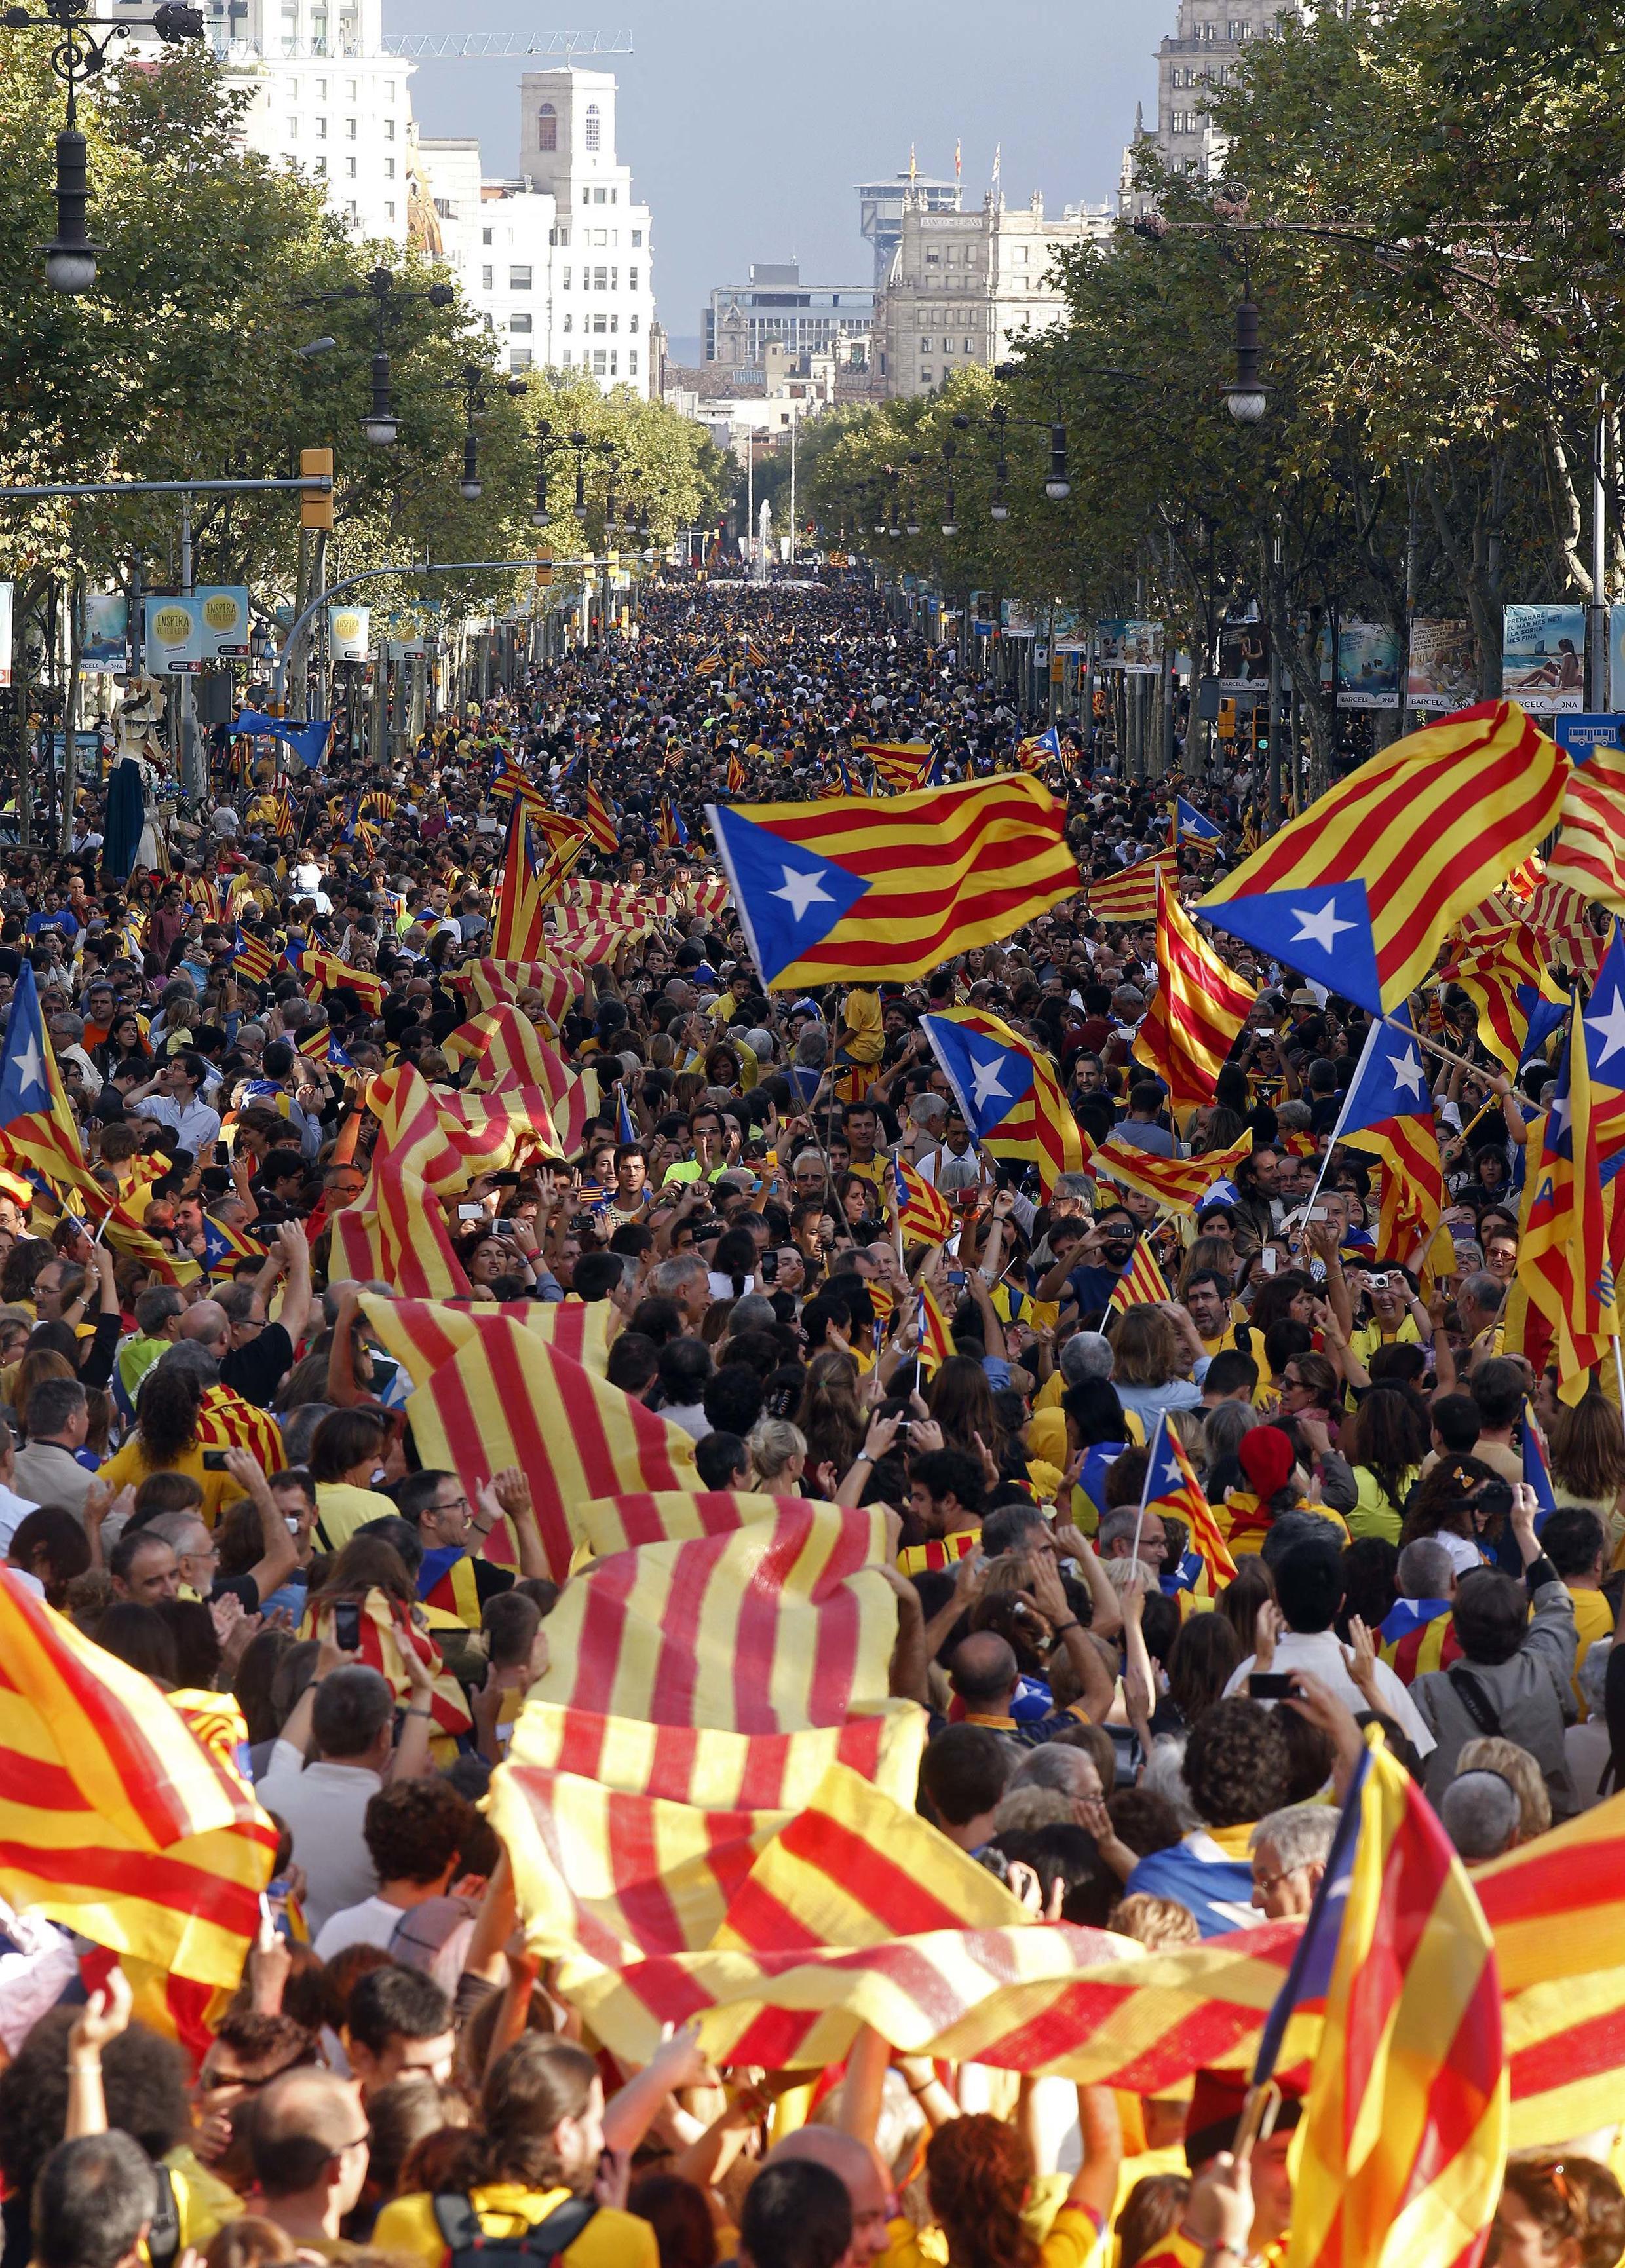 Cadena humana en Barcelona a favor de la independencia.